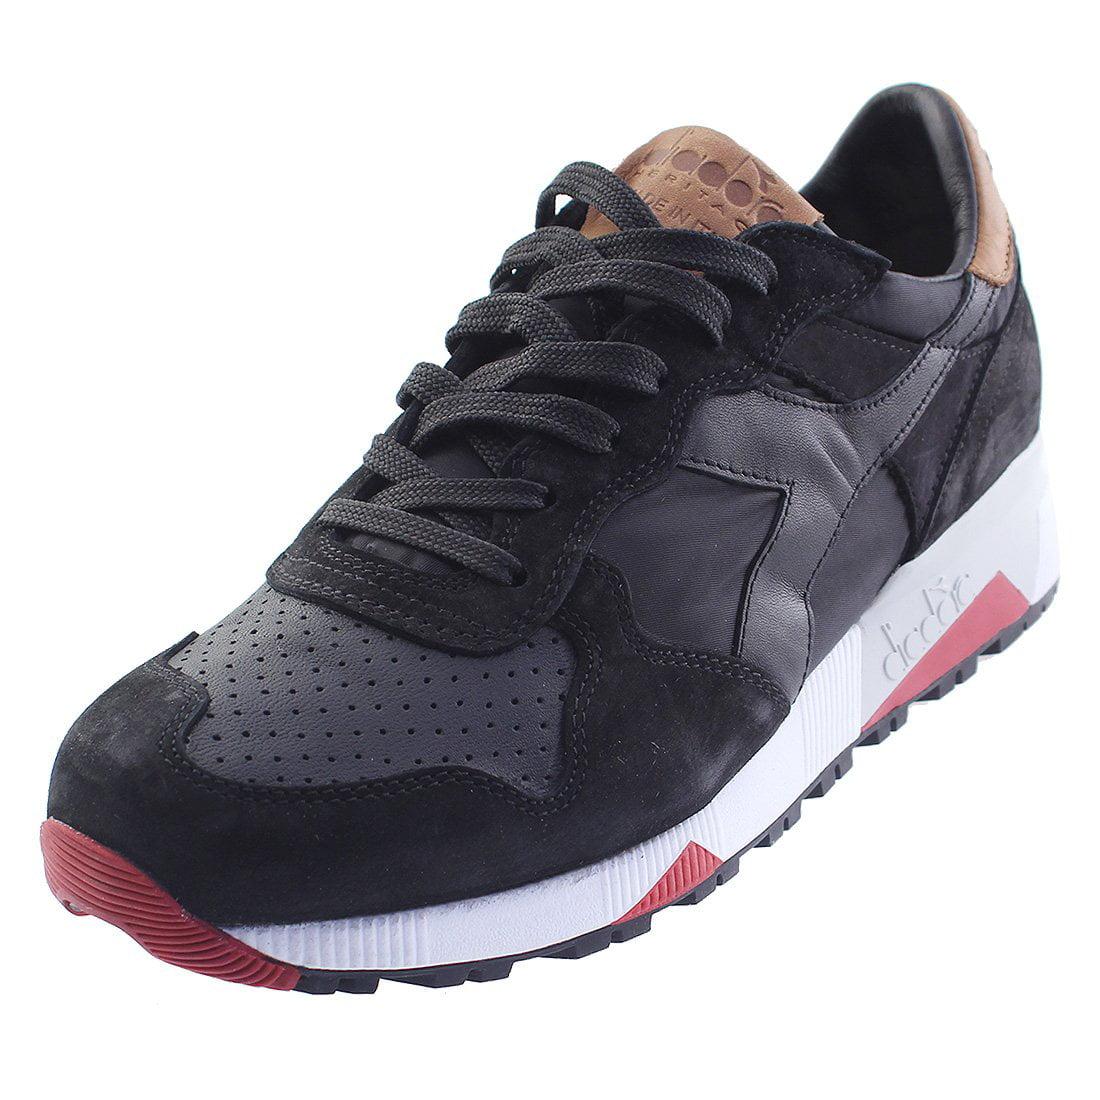 Meno Si suppone che impegnarsi  Diadora - Diadora 161303-C6370: Heritage Trident 90 Black Sneaker -  Walmart.com - Walmart.com